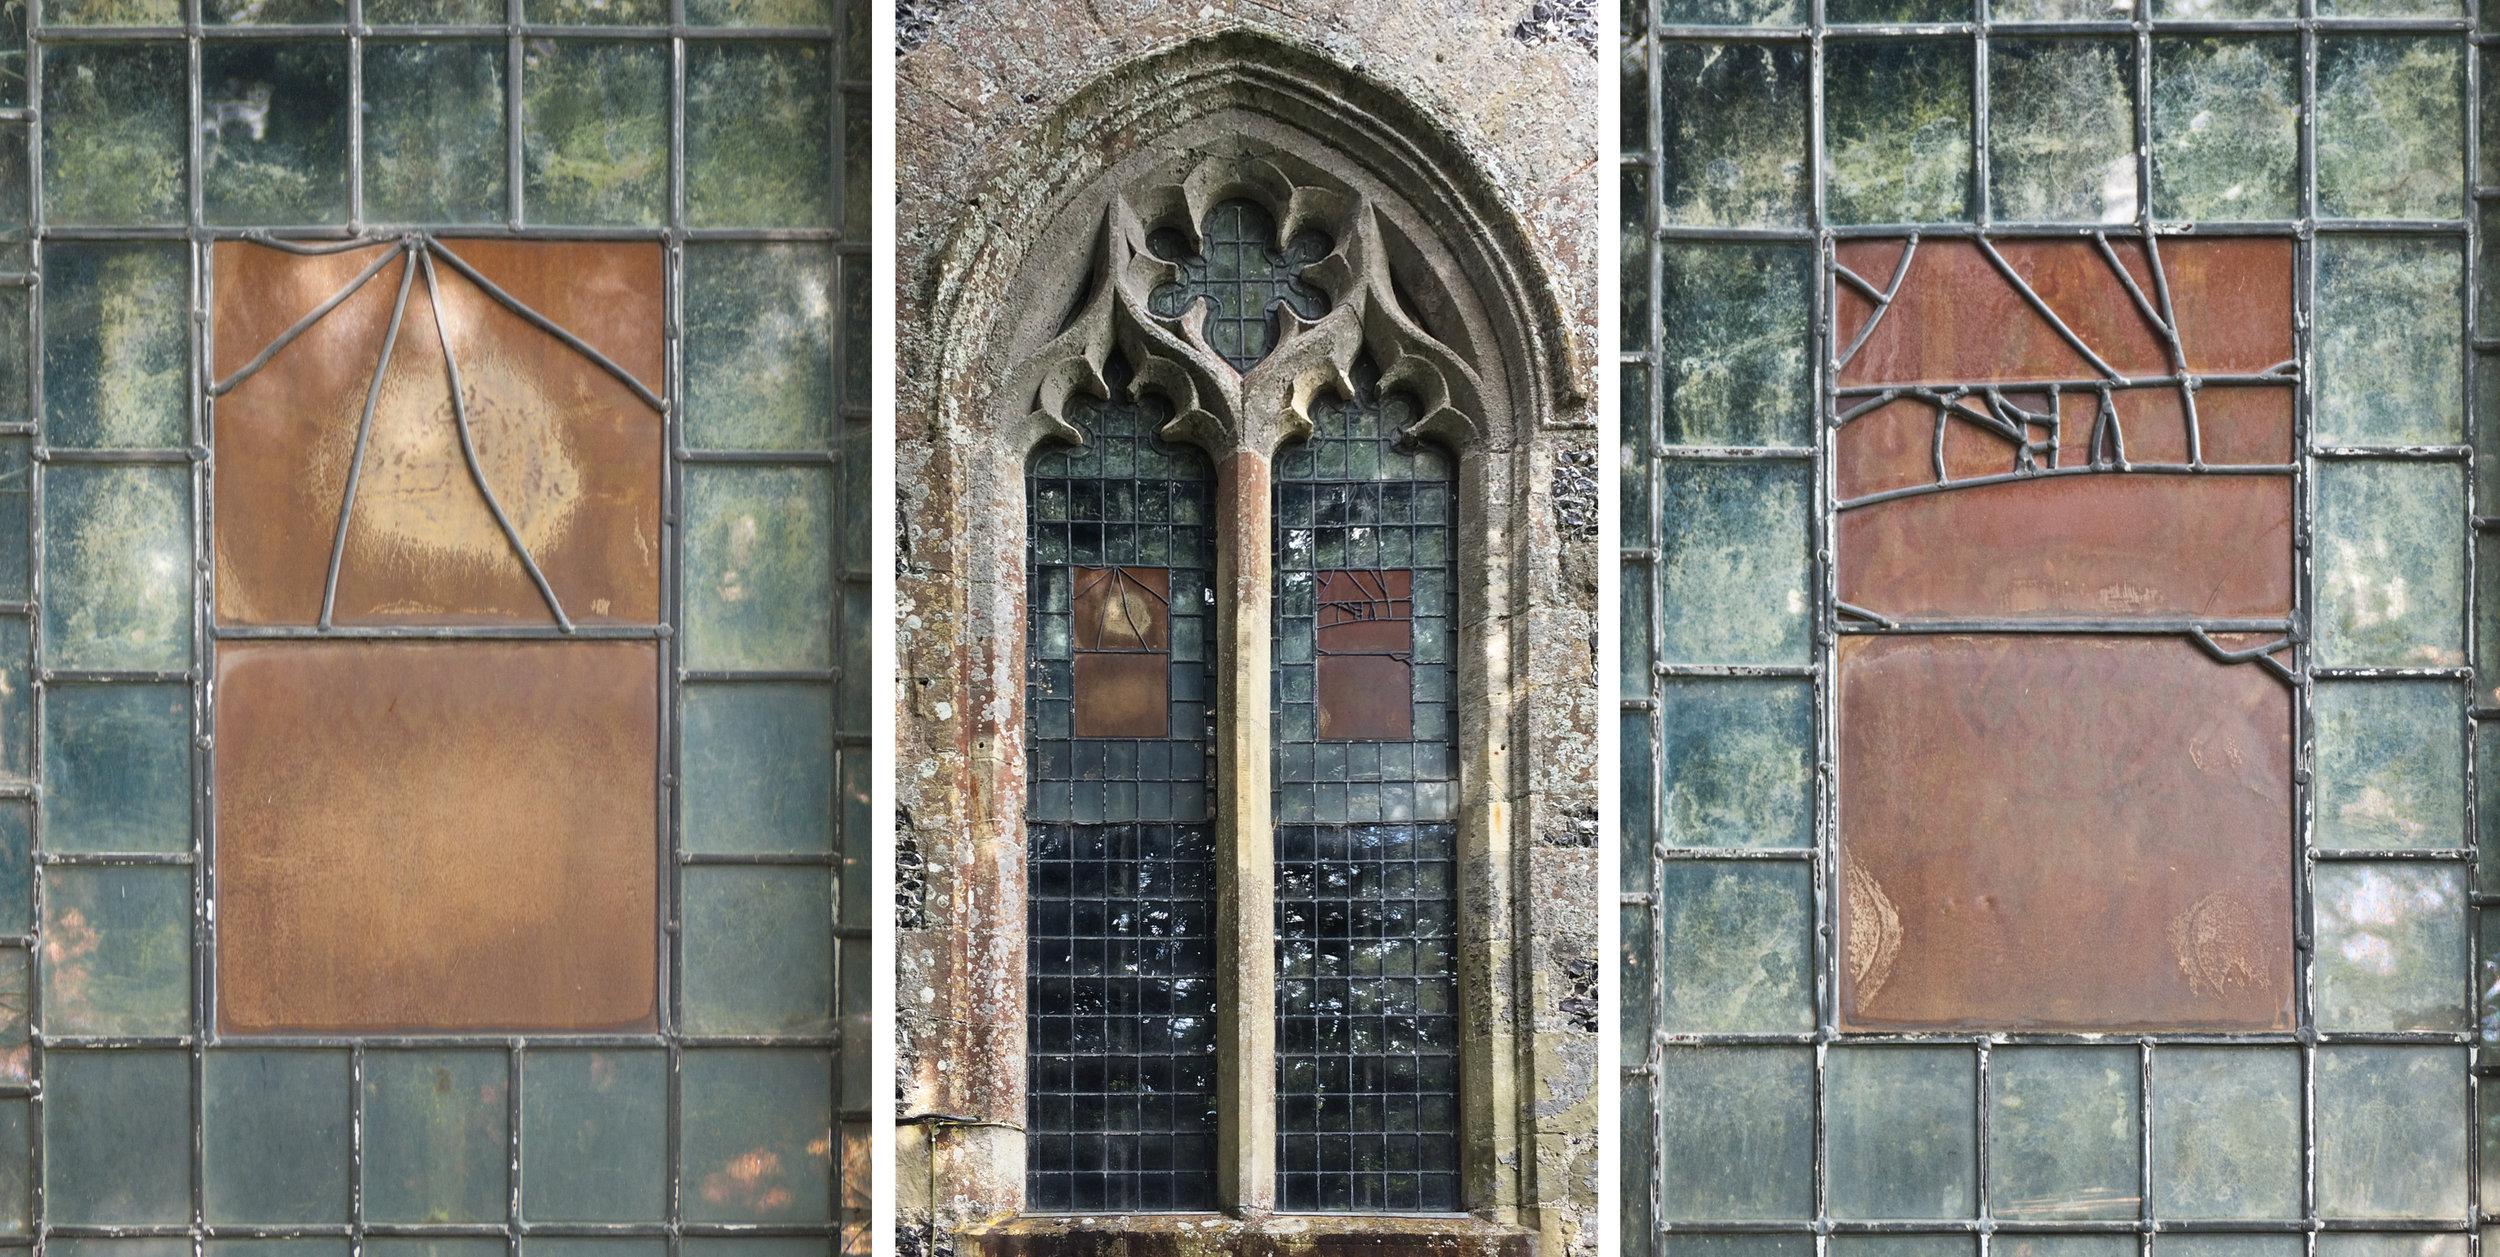 West facing window, All Saints, Fittleton